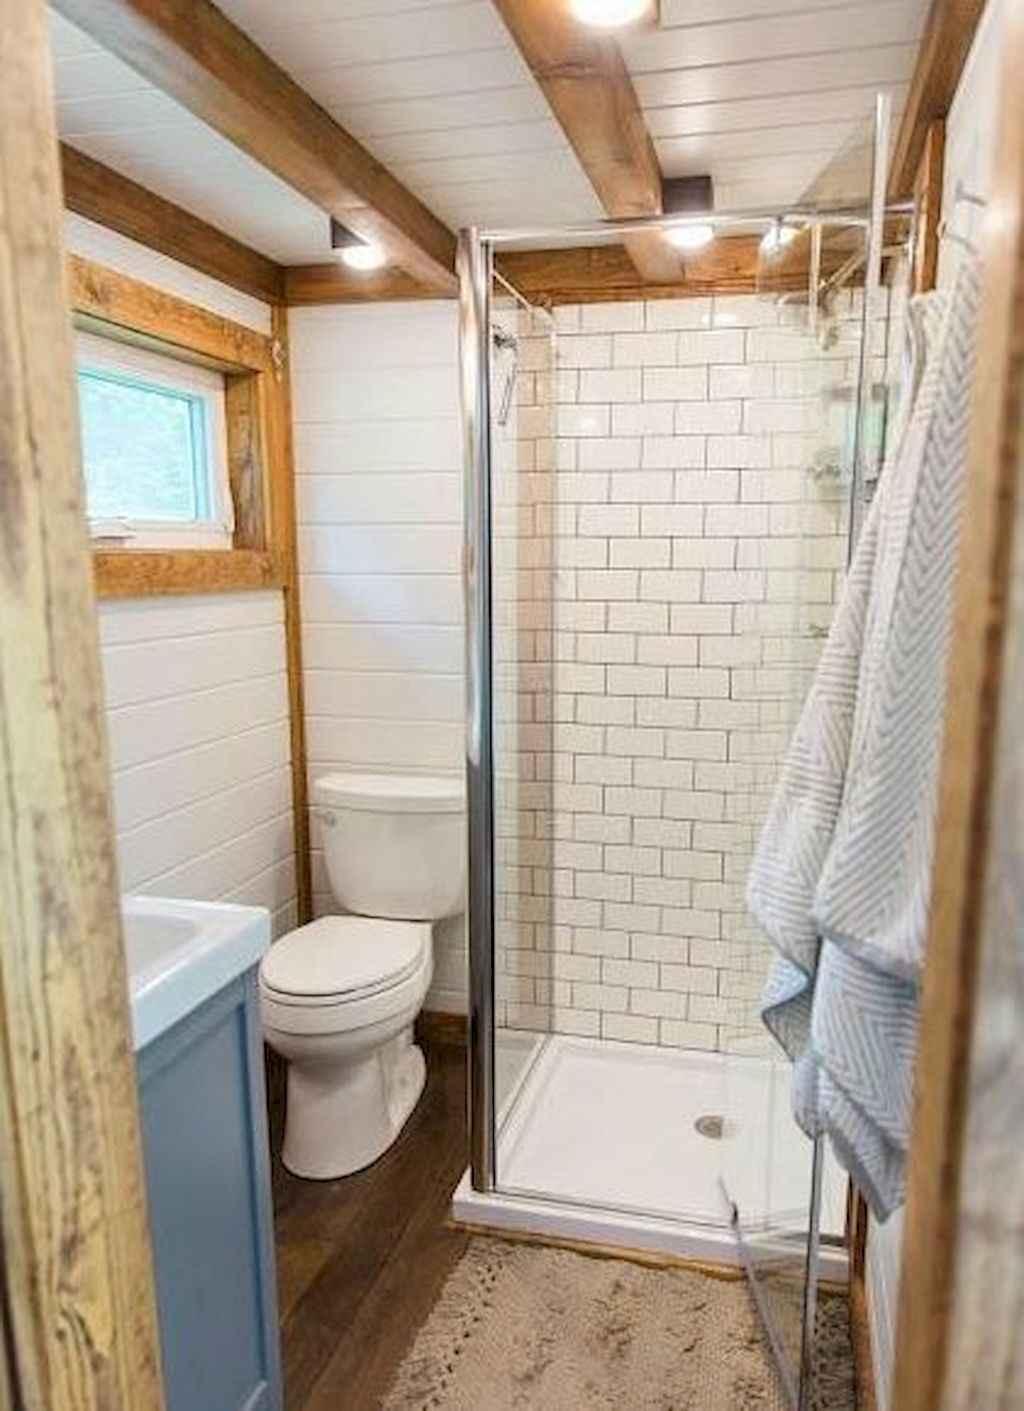 Amazing tiny house bathroom shower ideas (48) - HomeSpecially